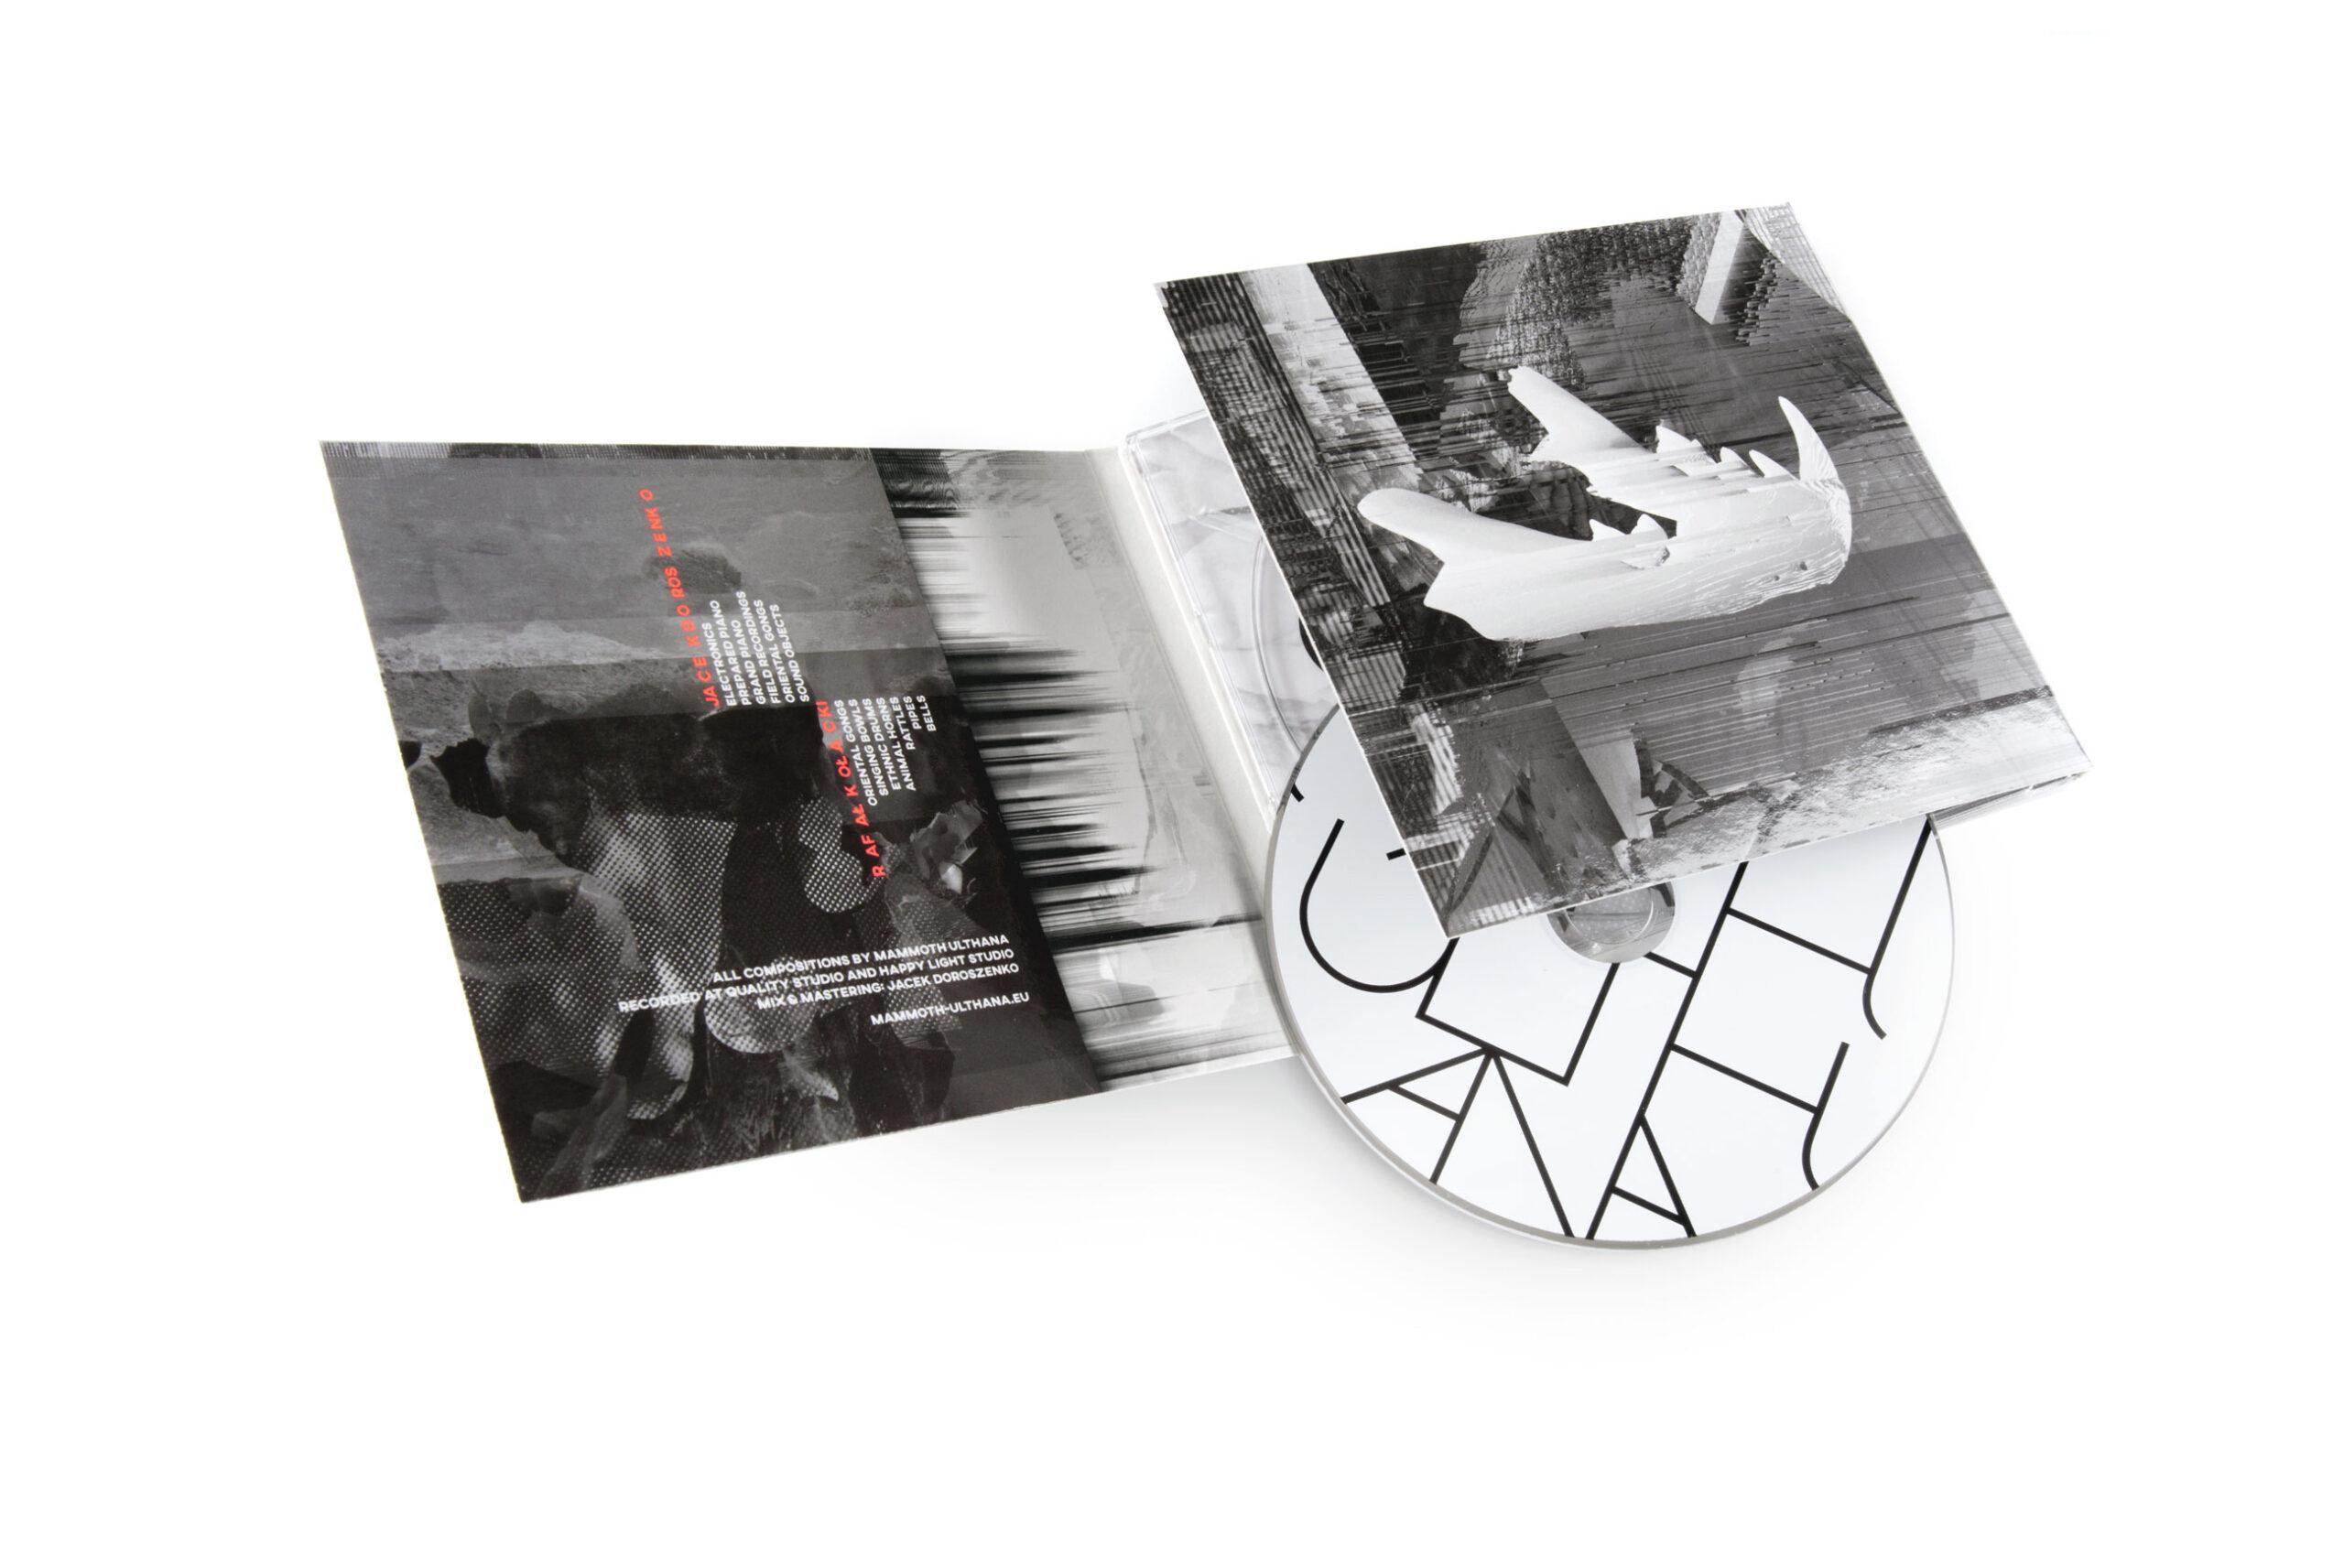 Jacek Doroszenko and Rafał Kołacki - Mammoth Ulthana, Particular Factors, album detail 7